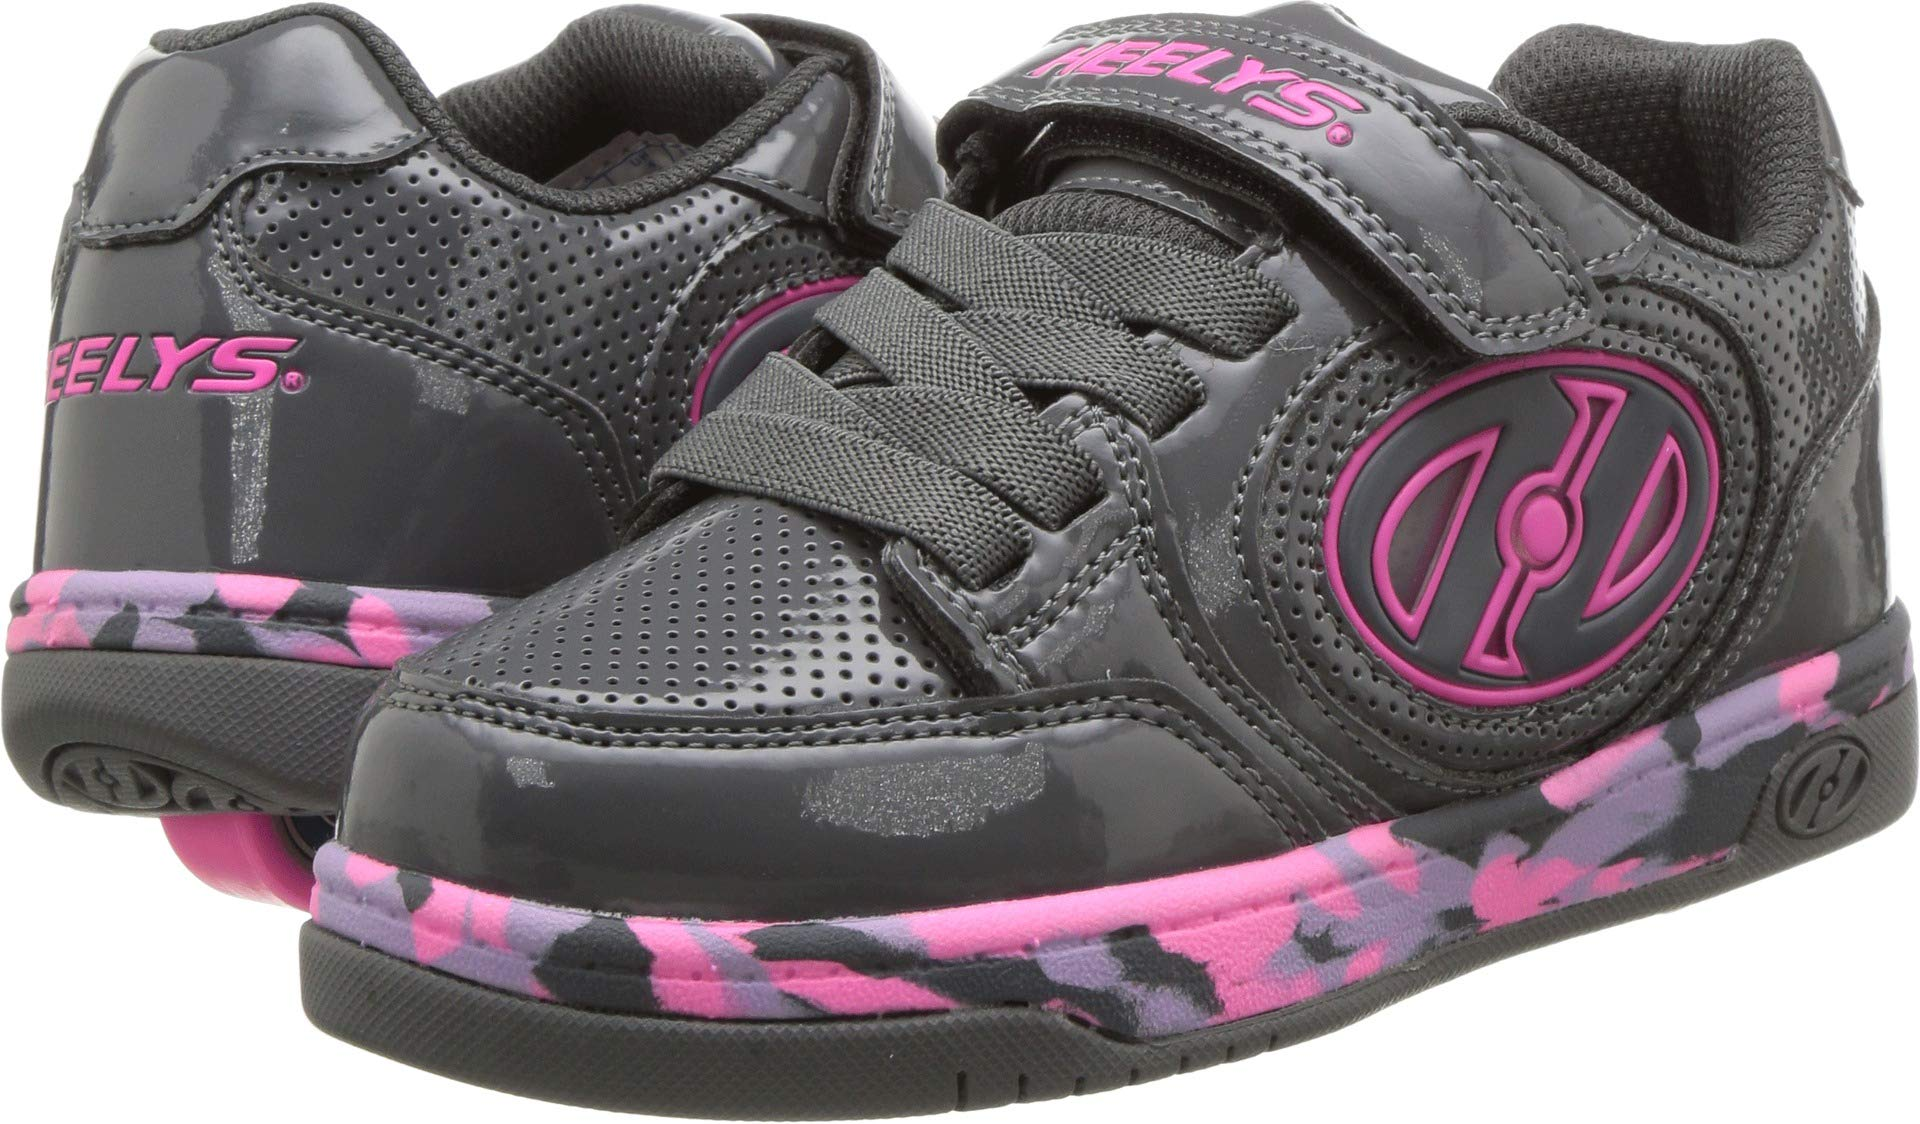 Heelys Kids' Plus X2 Lighted Tennis Shoe, Charcoal/Fuchsia/Purple Confetti, 2 M US Little Kid